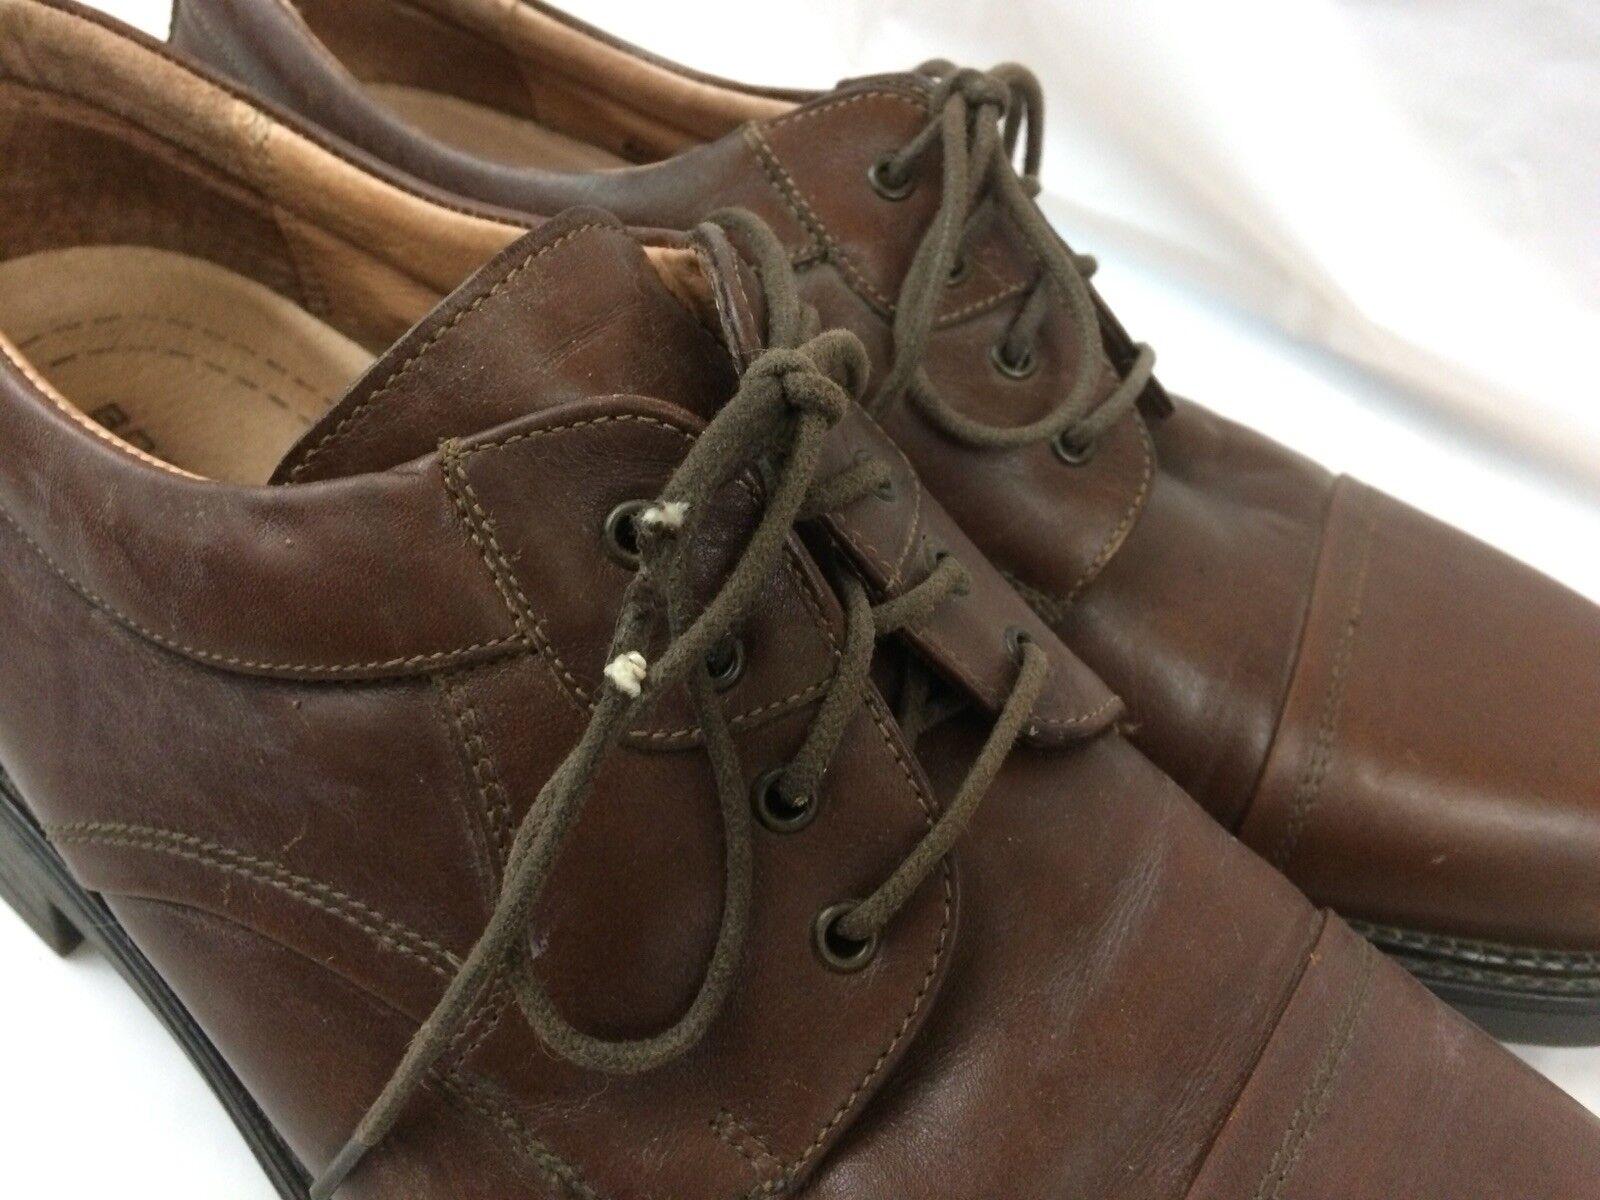 Bostonian Strada MEN 10.5 M Cap Toe Toe Toe braun Leather 22712 Oxford schuhe Dress Formal 7cb63d